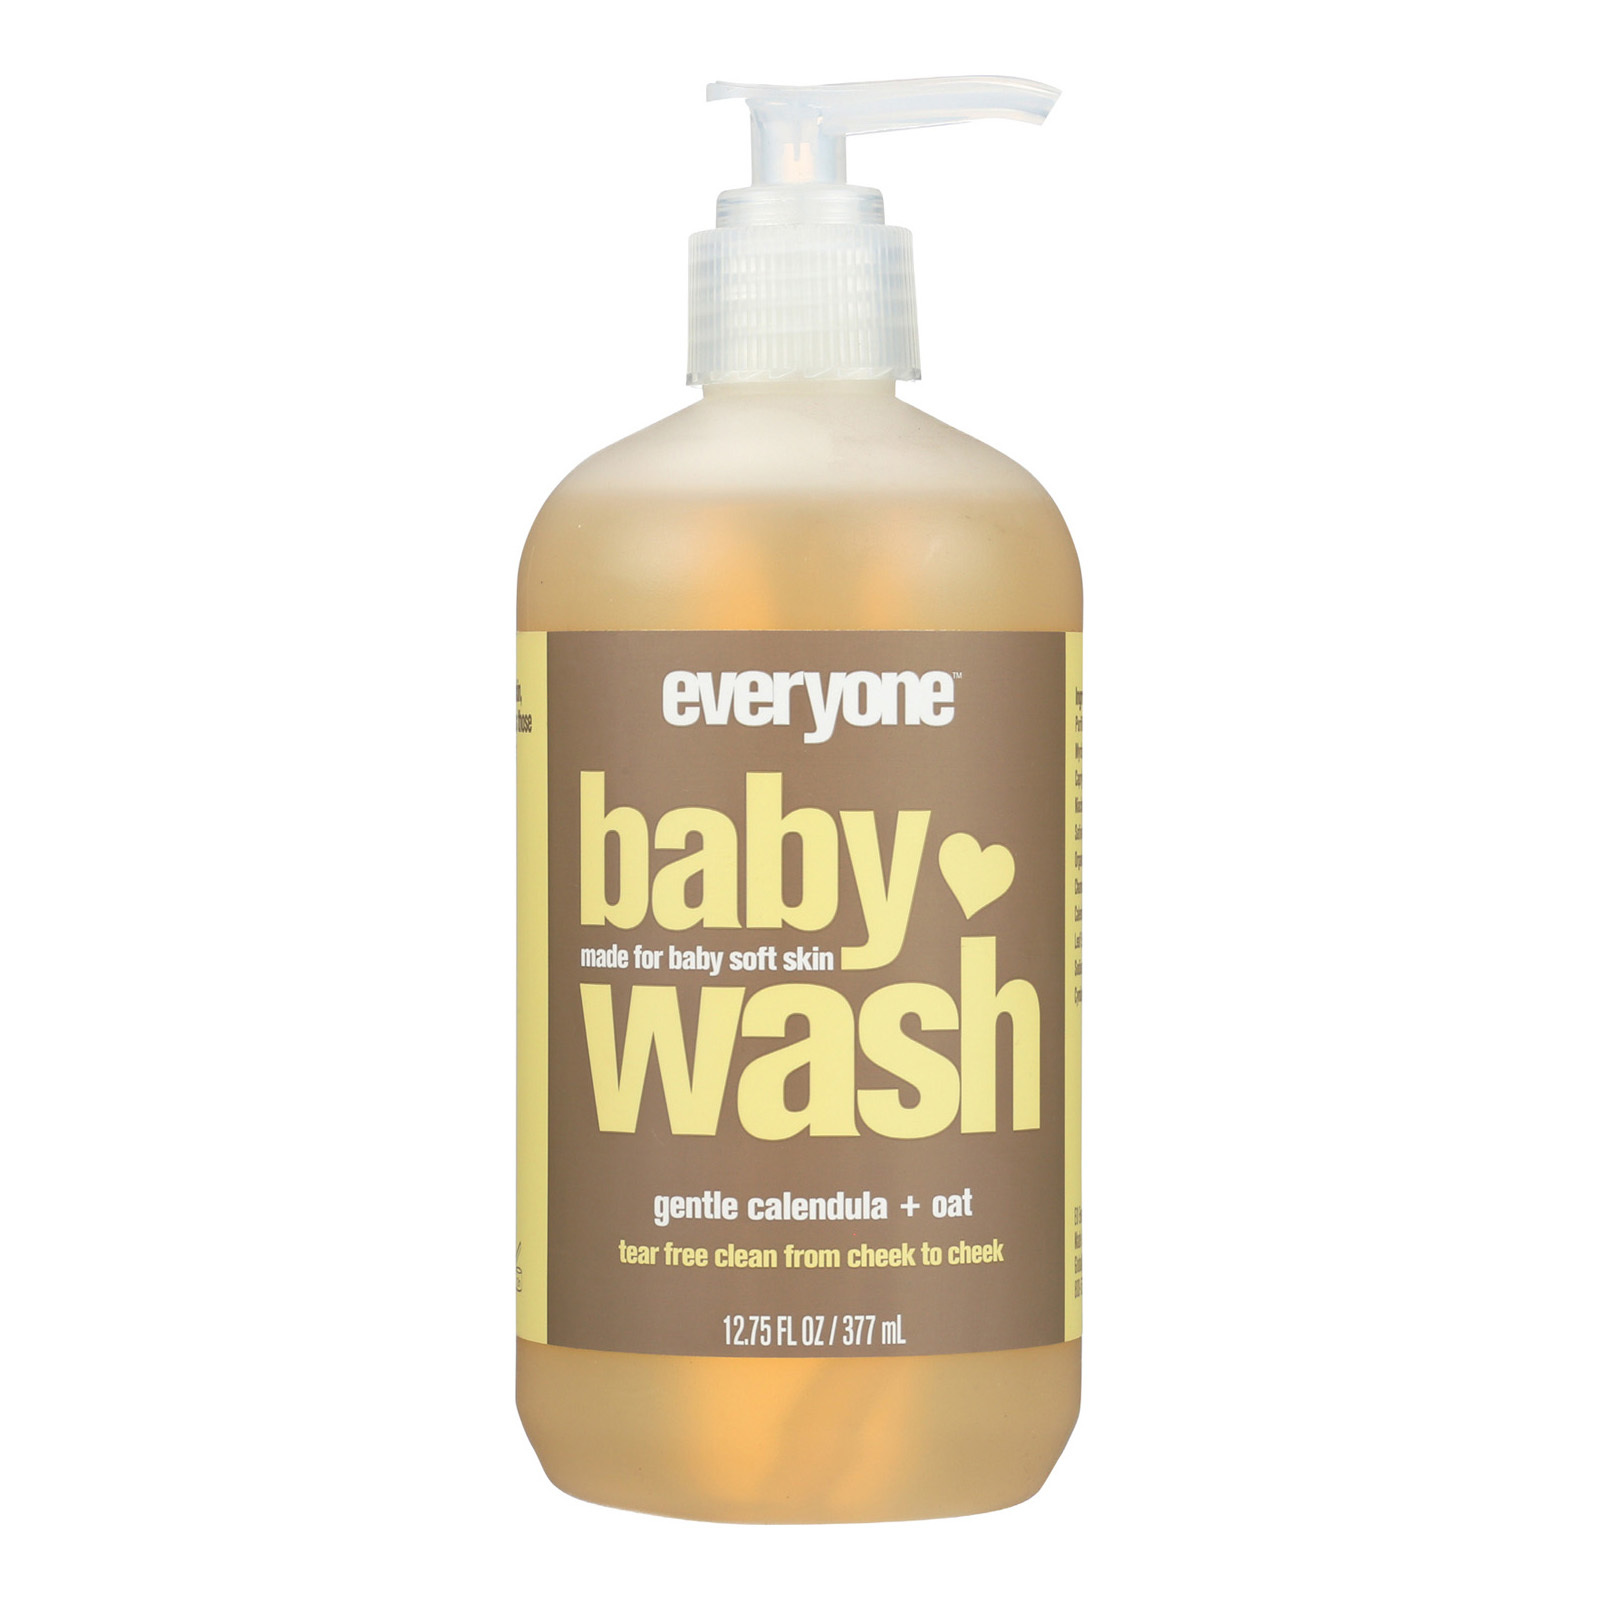 EO Baby Wash - Calendula Oat - 12.75 Fl oz.